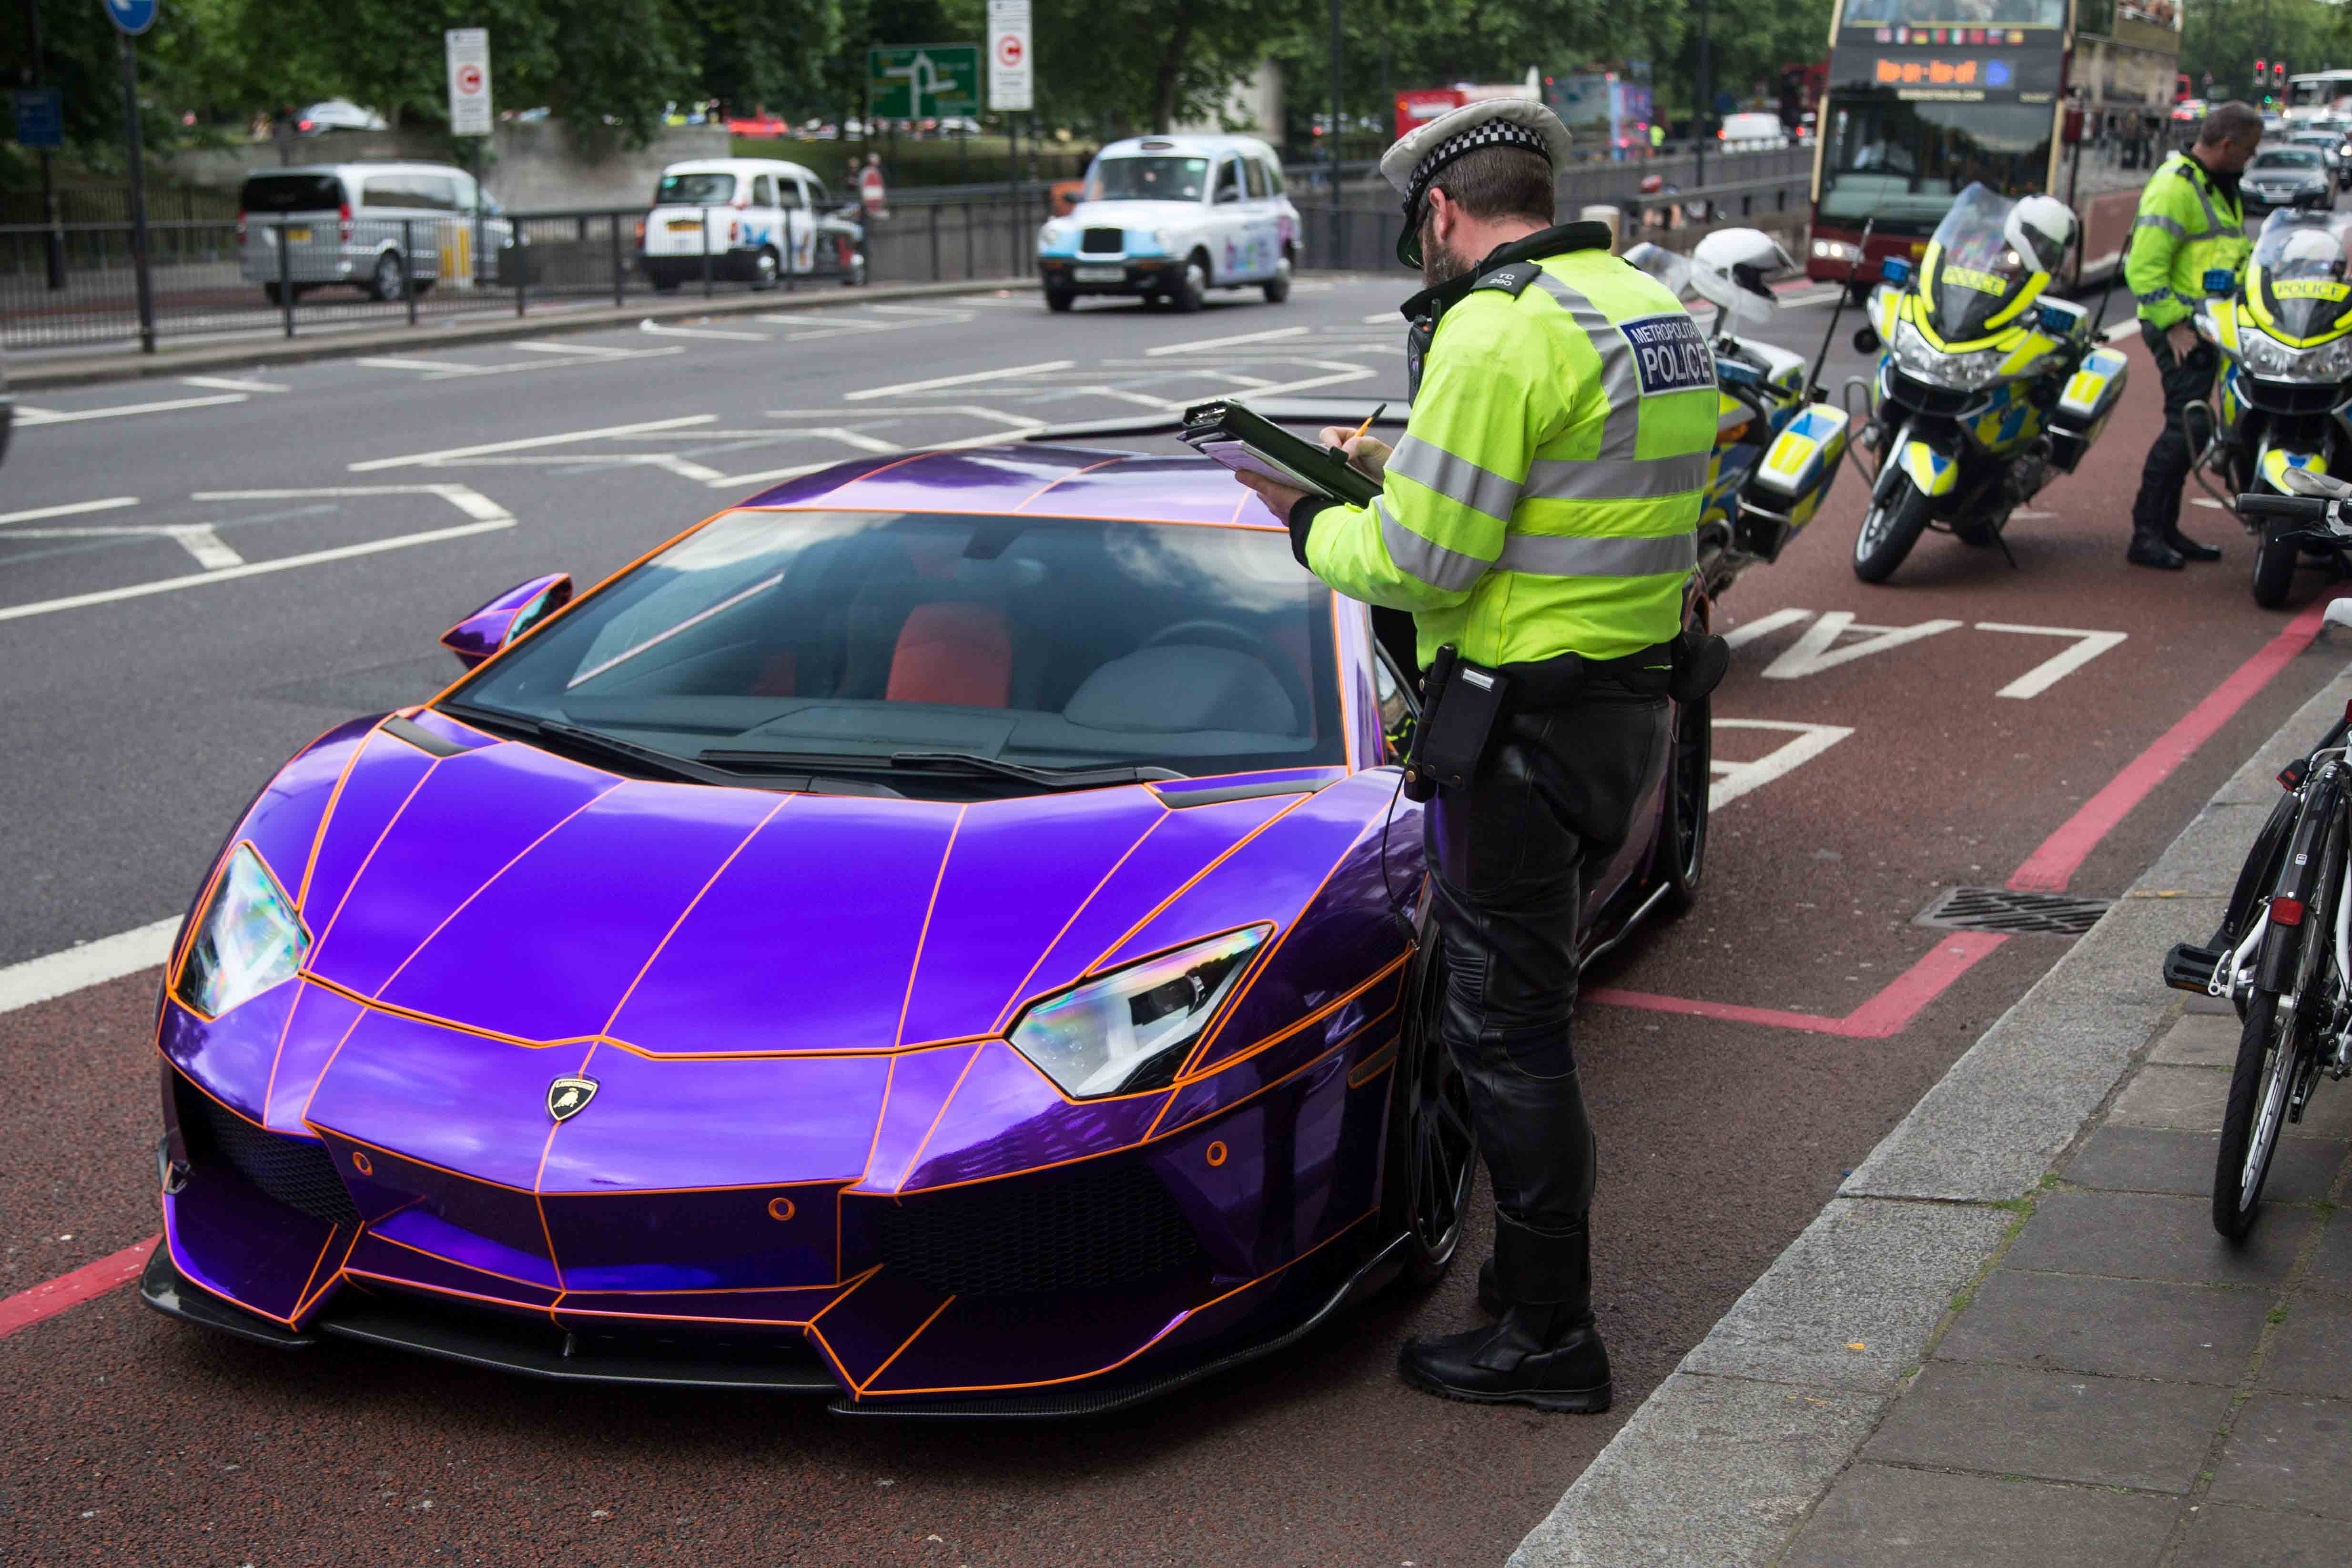 Glow-in-the-dark' Lamborghini seized by London police